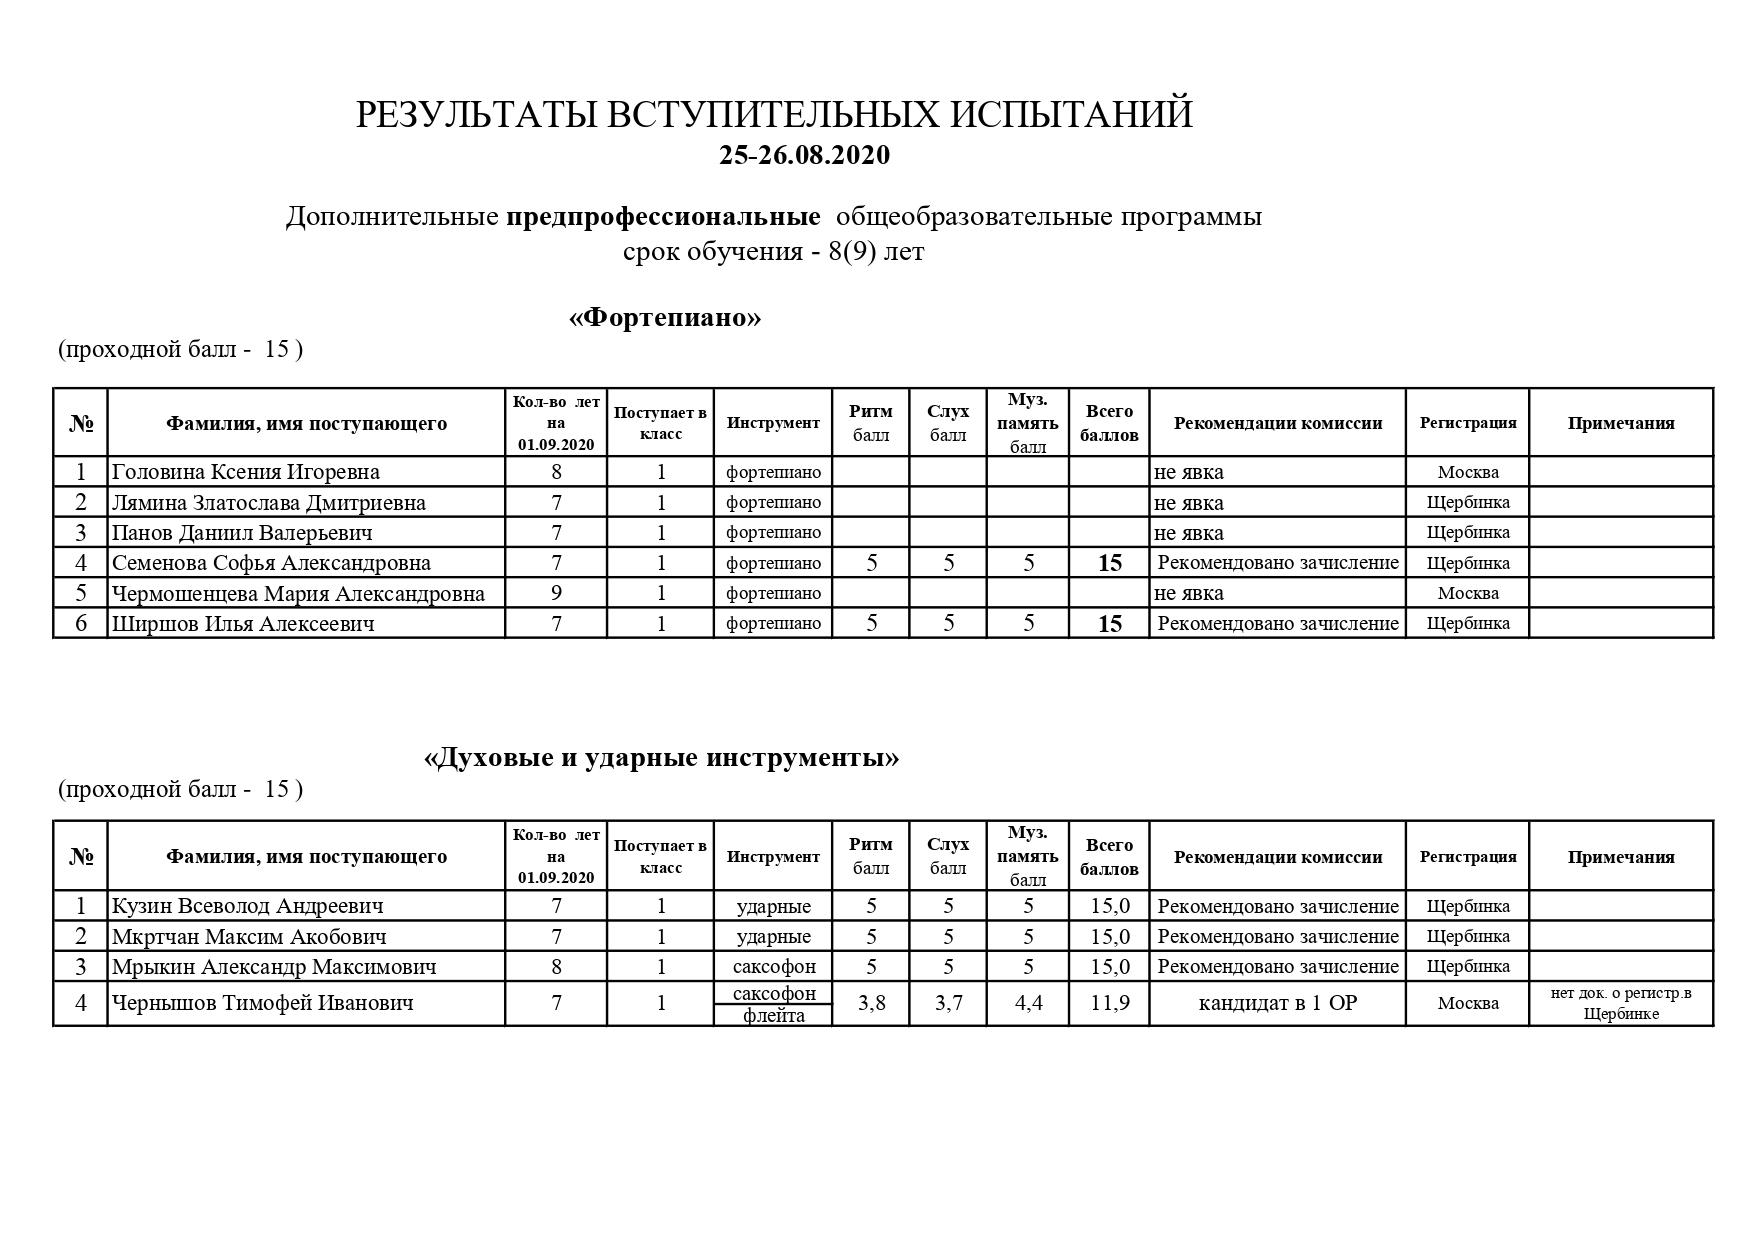 Рез.вст.исп. 25-26.08.20 ПП_page-0001